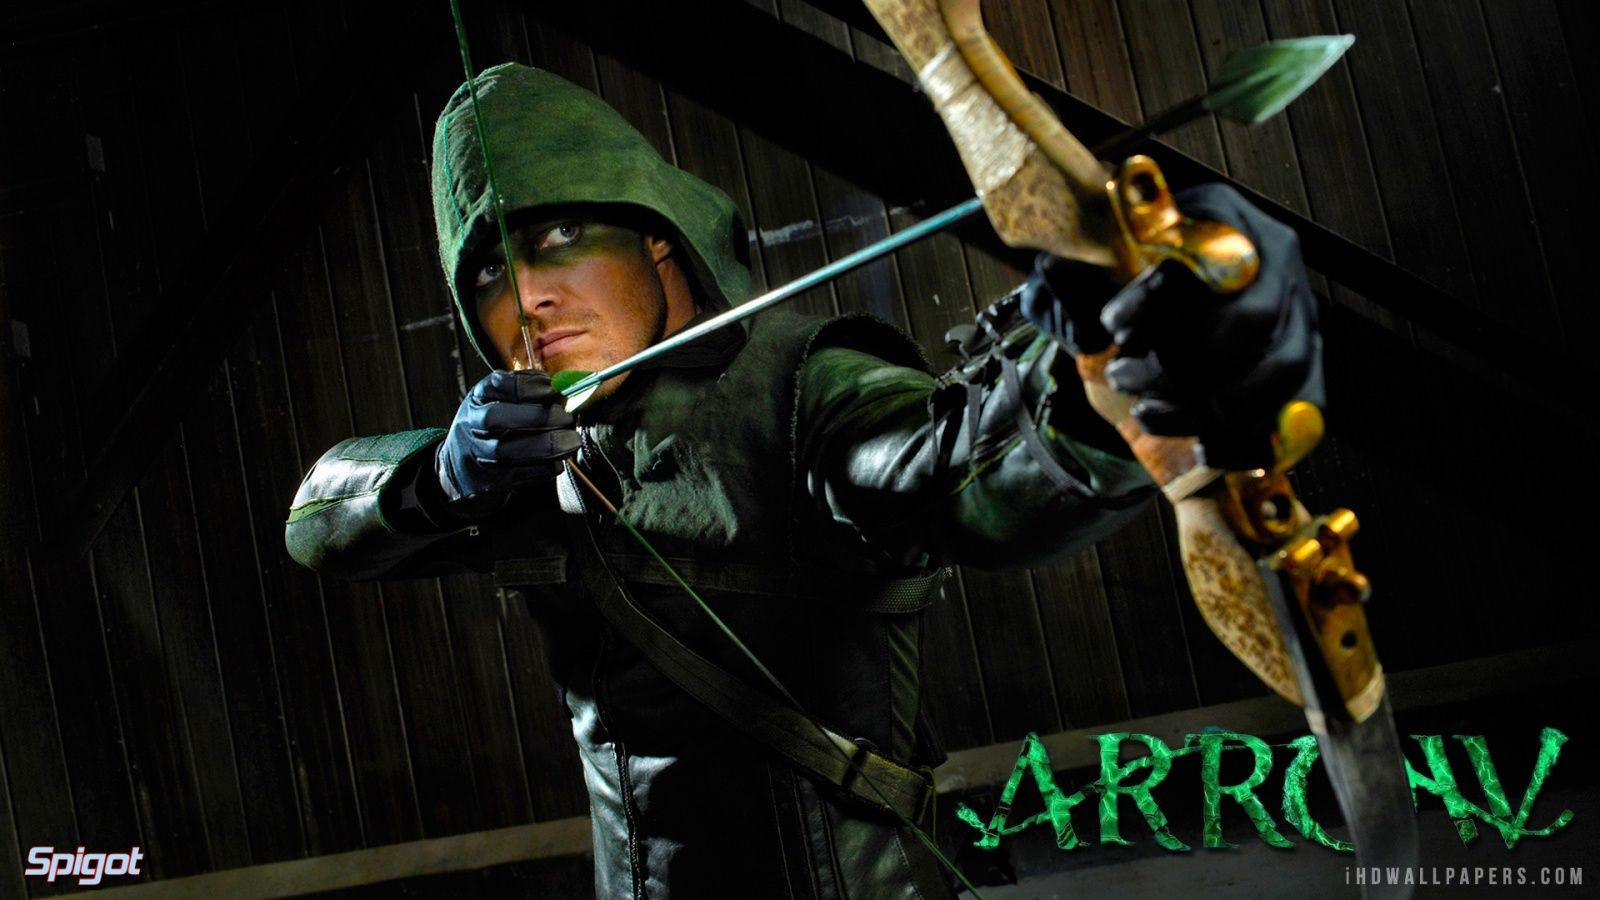 Cw Arrow Wallpaper Cw Arrow Hd Wallpaper Ihd Wallpapers Arrow Tv Series Arrow Tv Arrow Memes